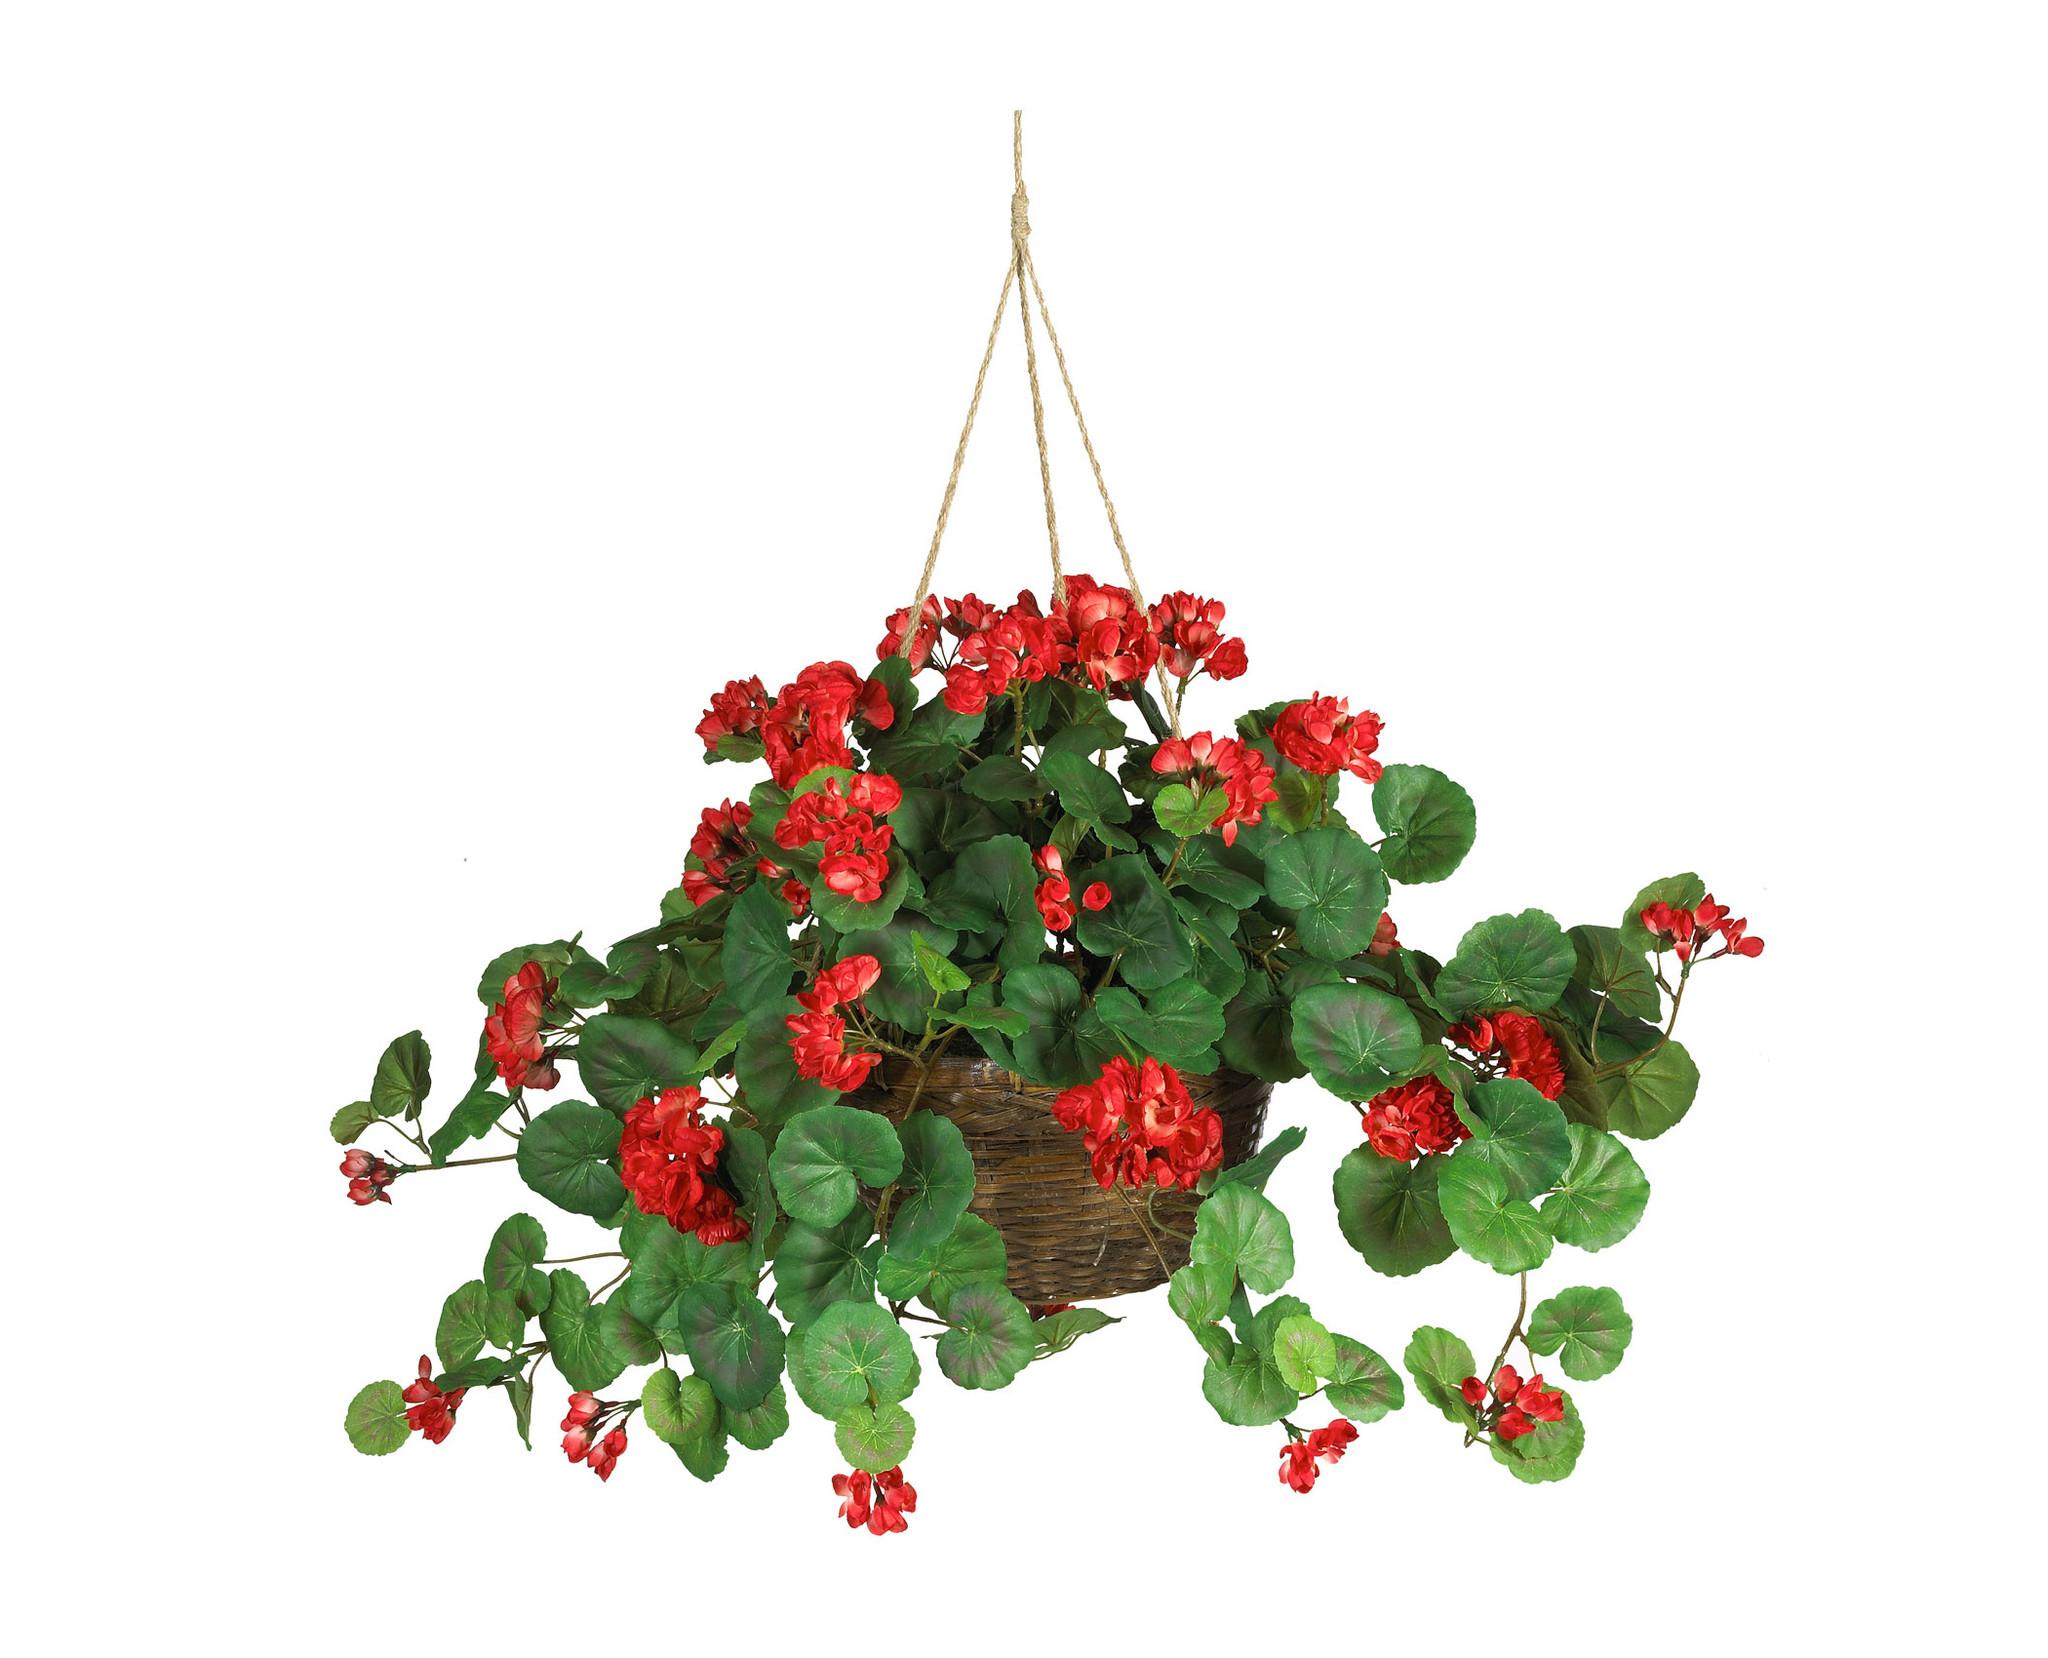 Red Flowers For Hanging Baskets 30 Background Wallpaper HdFlowerWallpaper